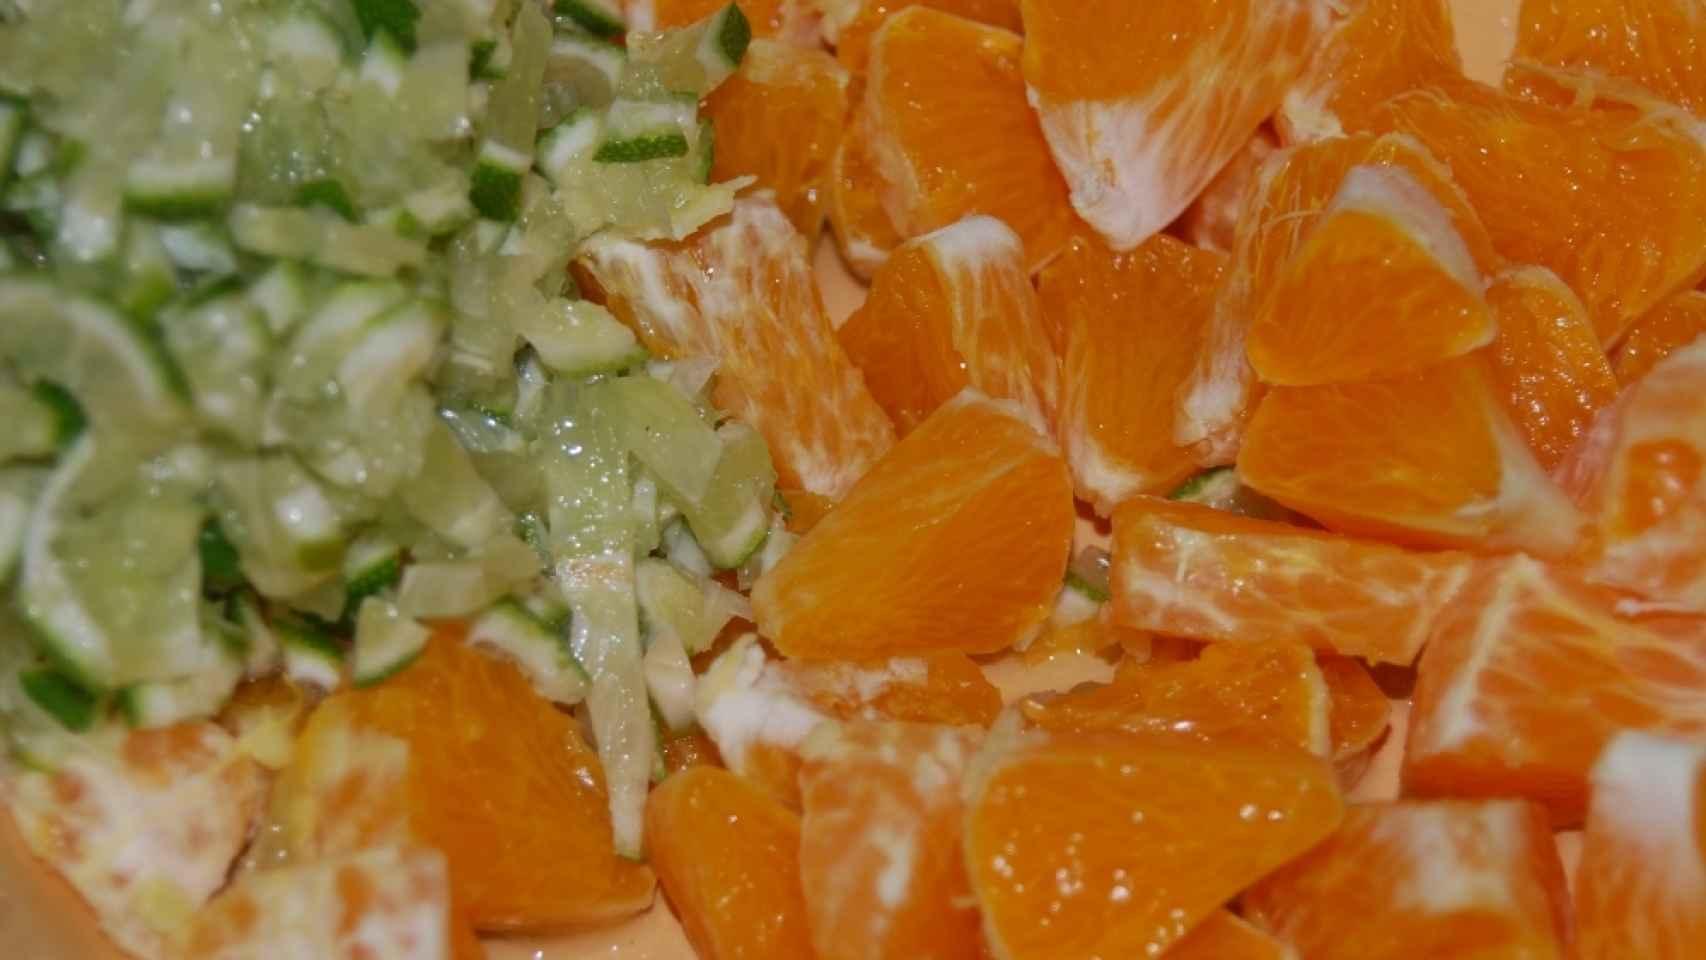 Naranja y lima cortadas